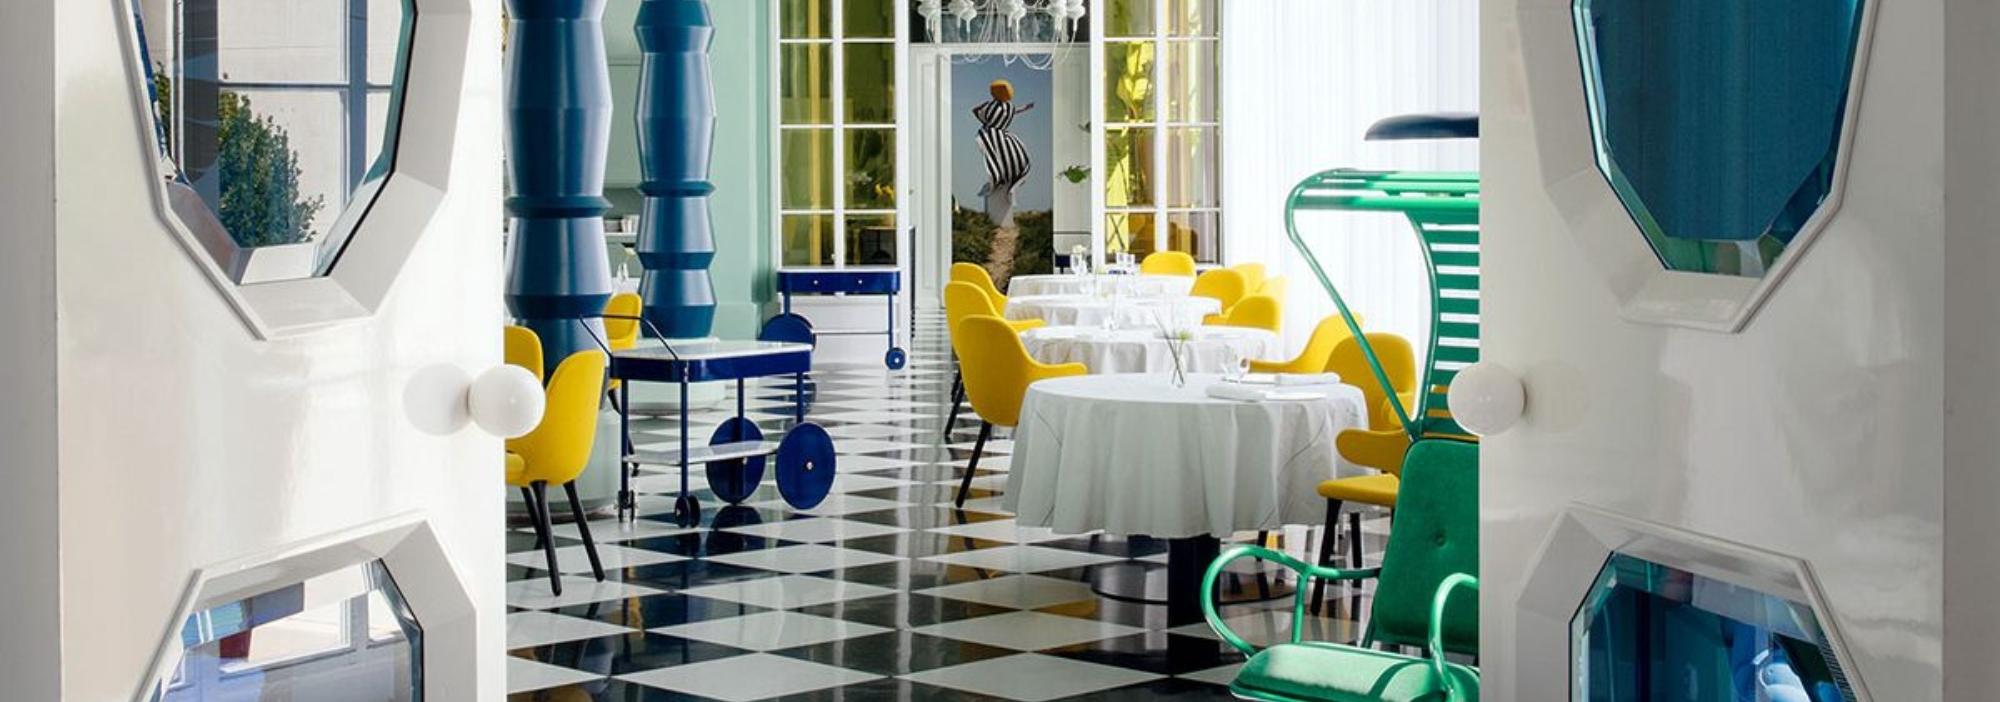 Restaurantes lujuosos y elegantes para disfrutares en Madrid restaurantes lujuosos Restaurantes lujuosos y elegantes para disfrutares en Madrid Featured 11